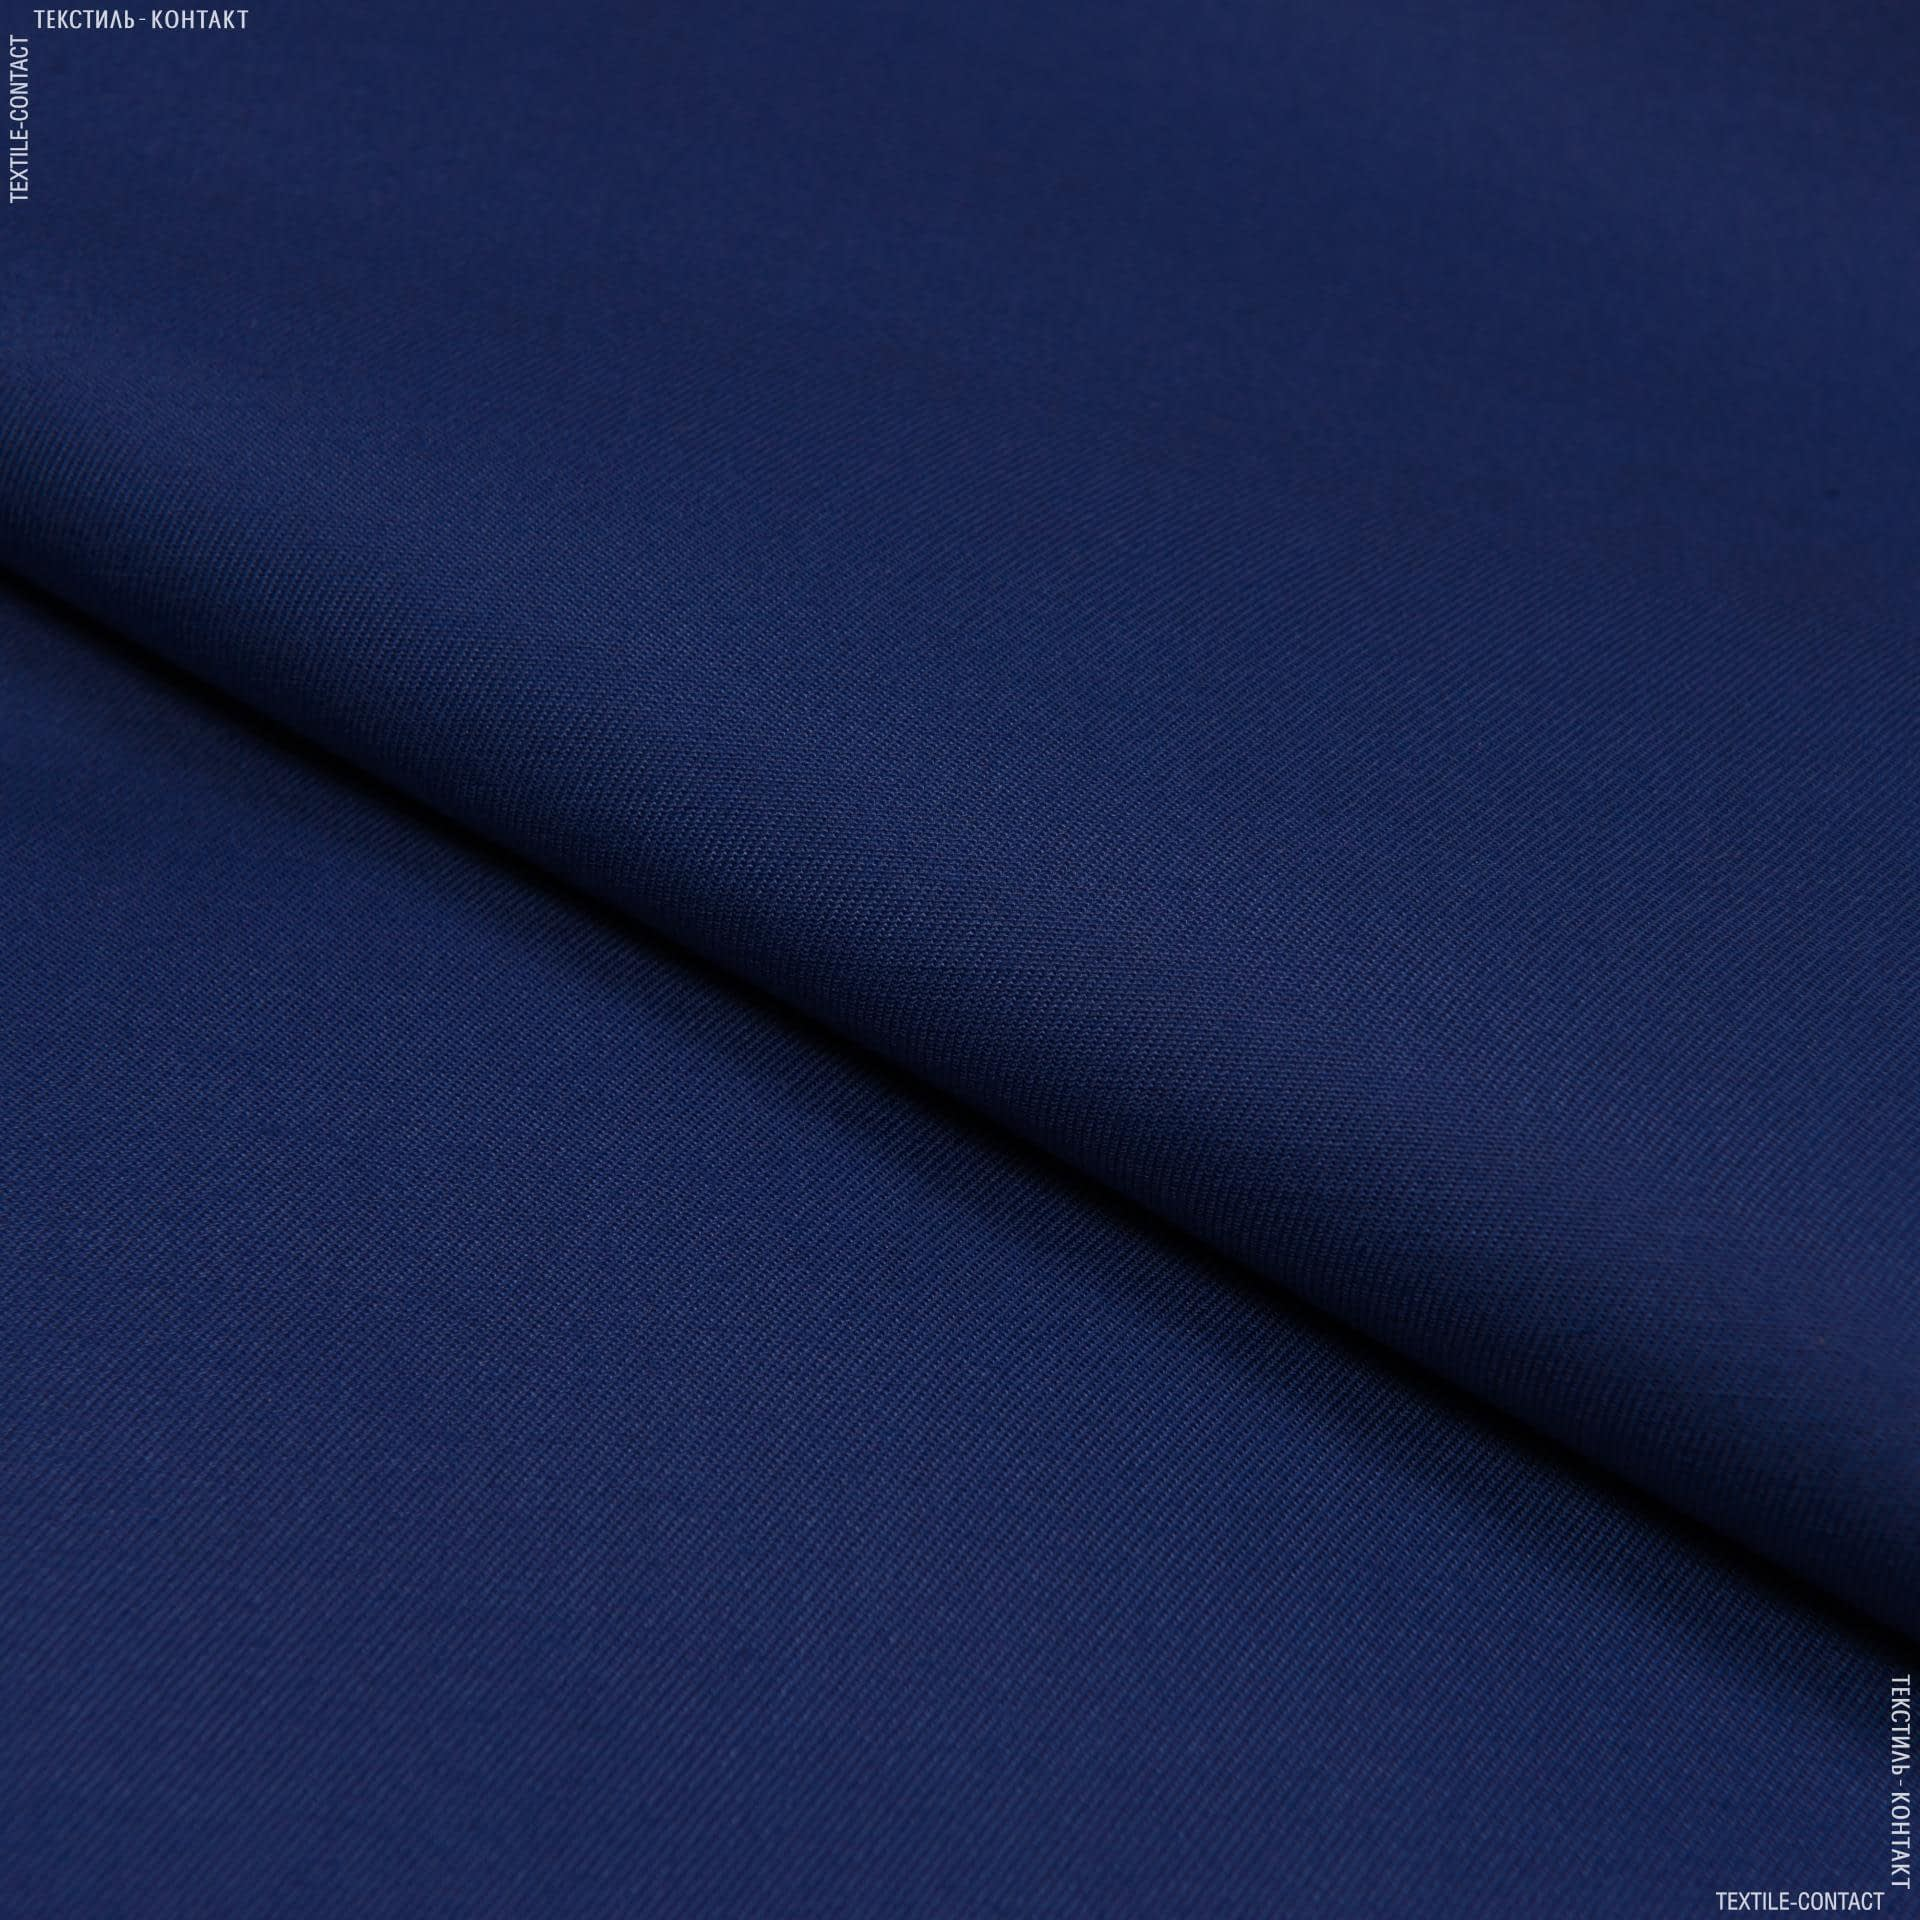 Ткани для рюкзаков - Саржа (юпитер-1) светло-синяя